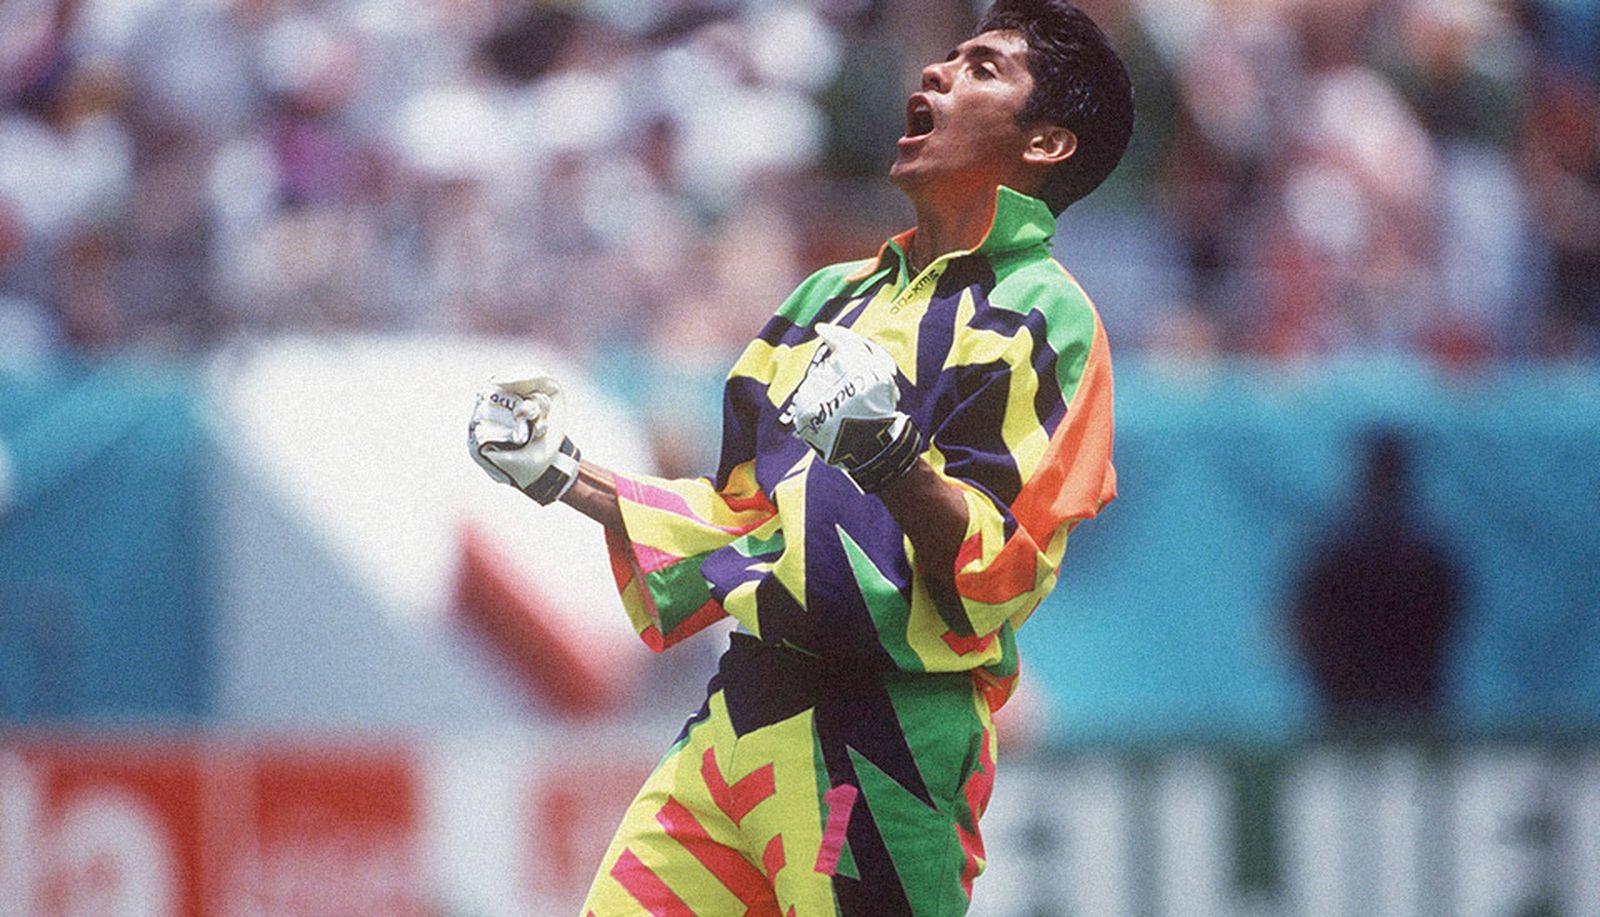 football kits 90s mexico 2018 FIFA World Cup Adidas Palace Skateboards